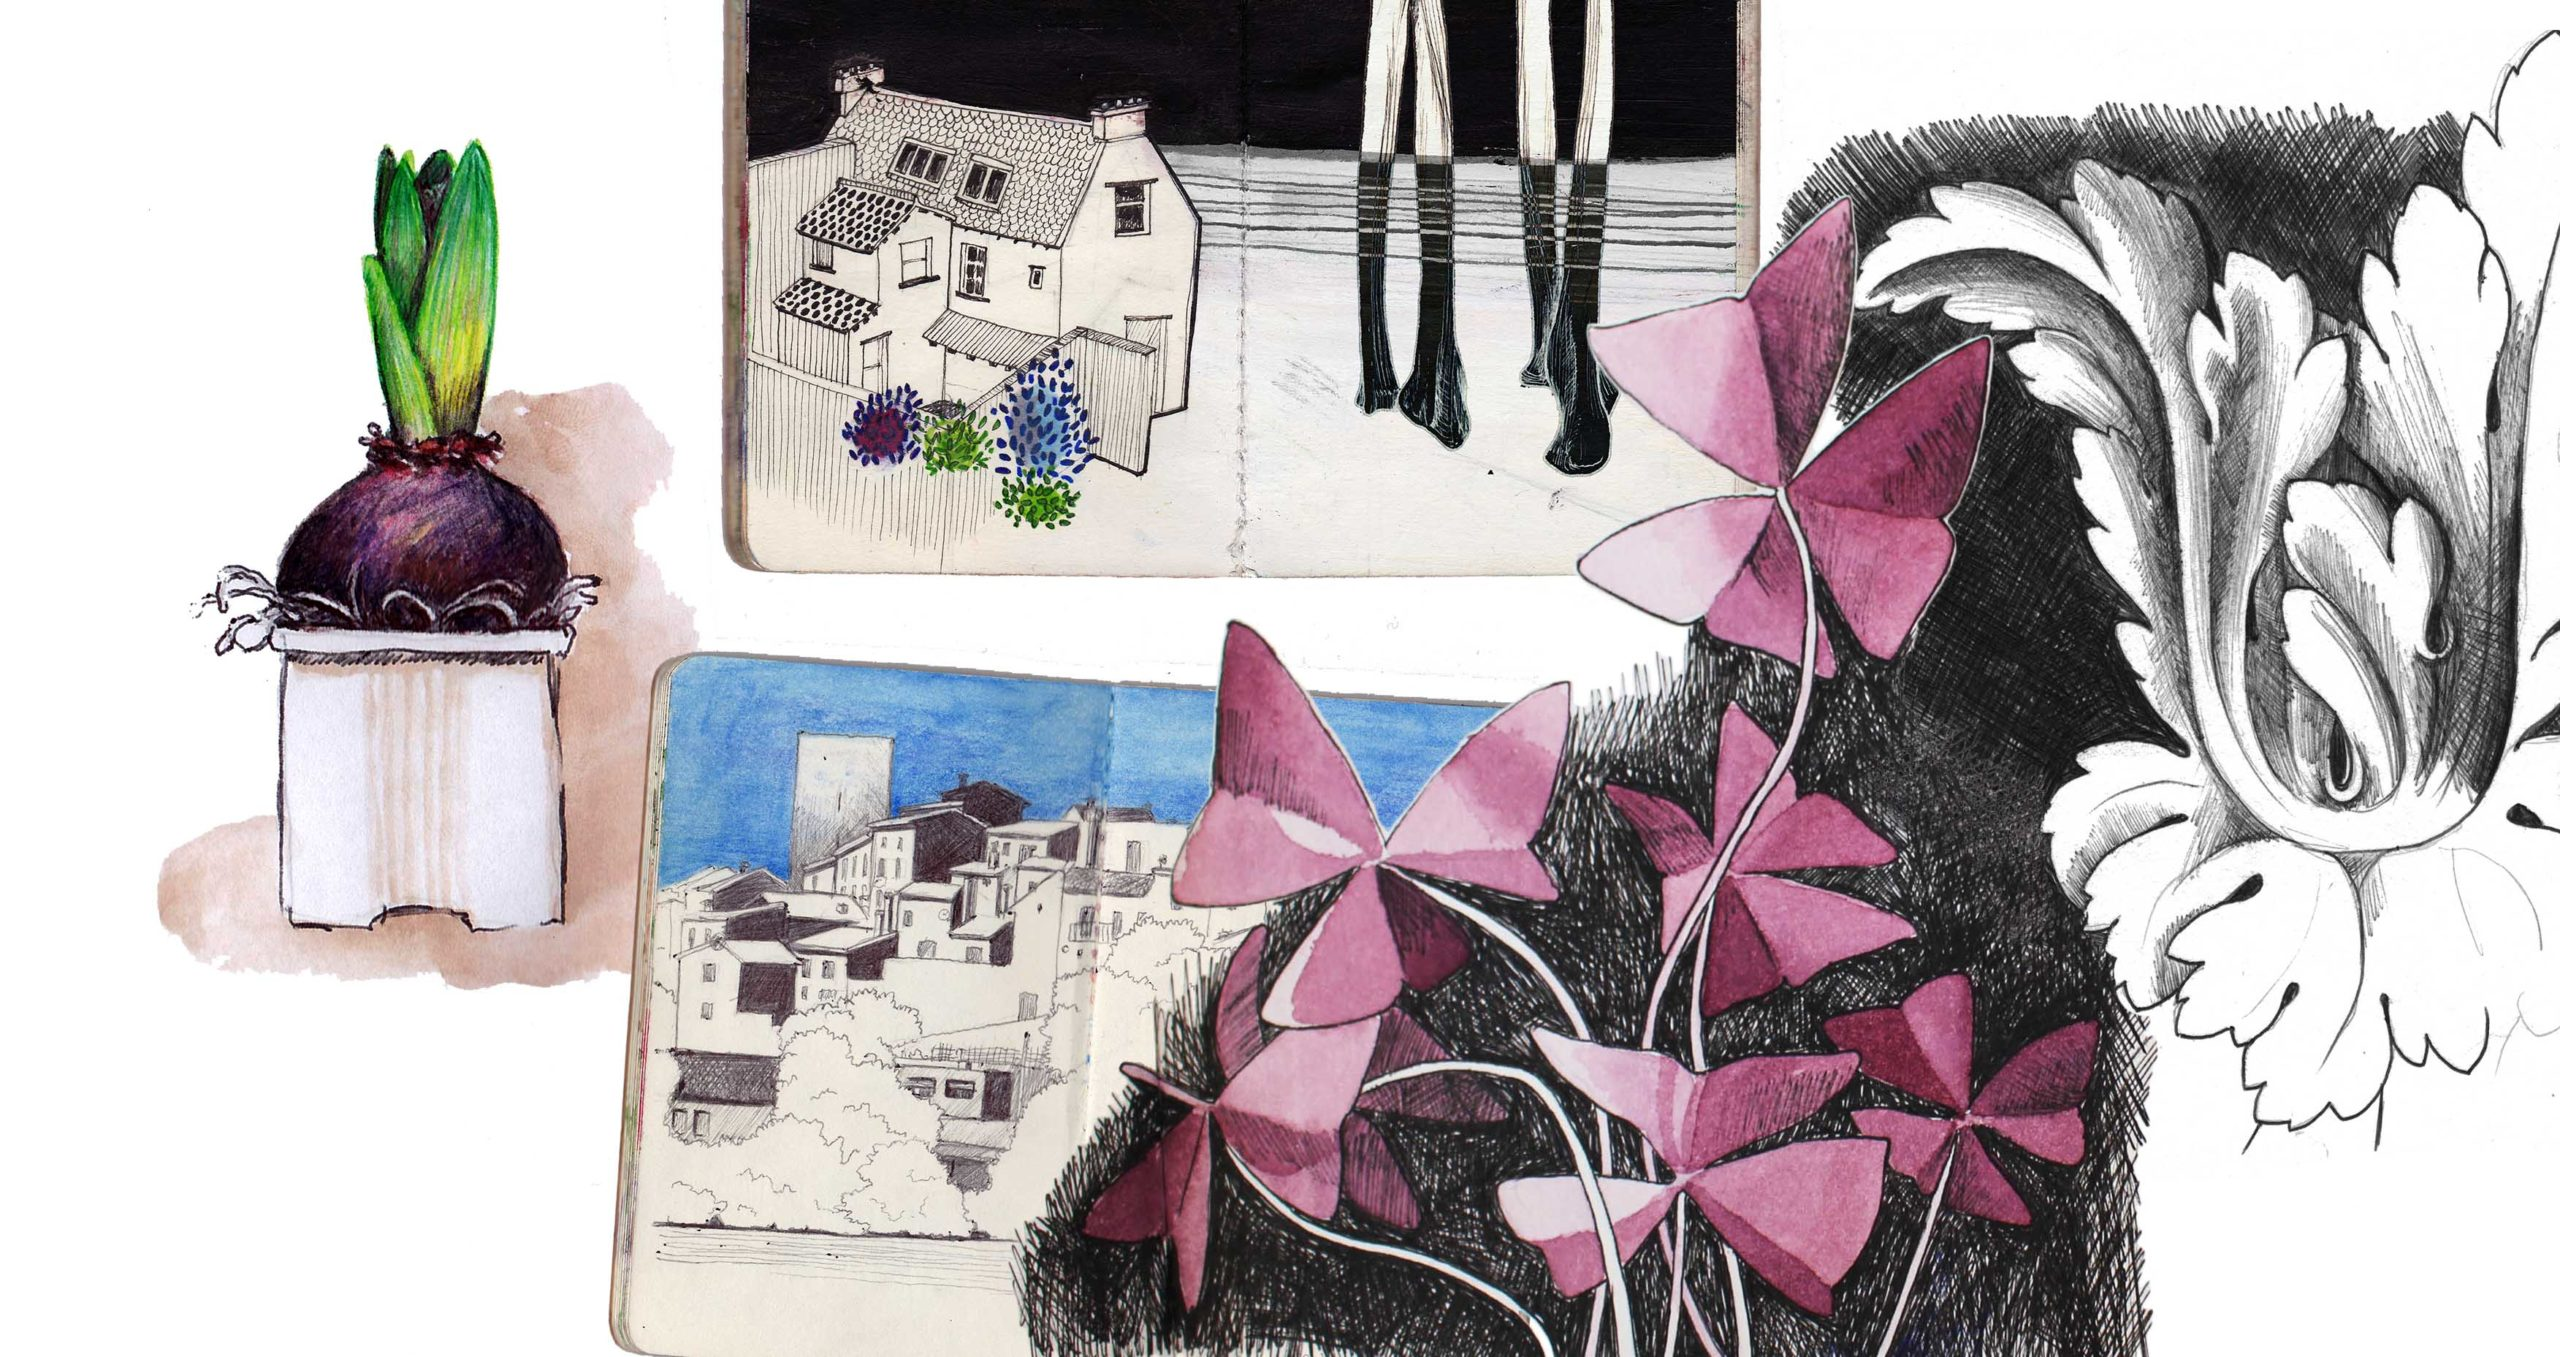 atelierba-atelier-ba-design-designer-berengere-ameslant-drome-royans-illustration-illustratrice-recueil-spectacle-musical-aquarelle-graphisme-croquis-dessin-4